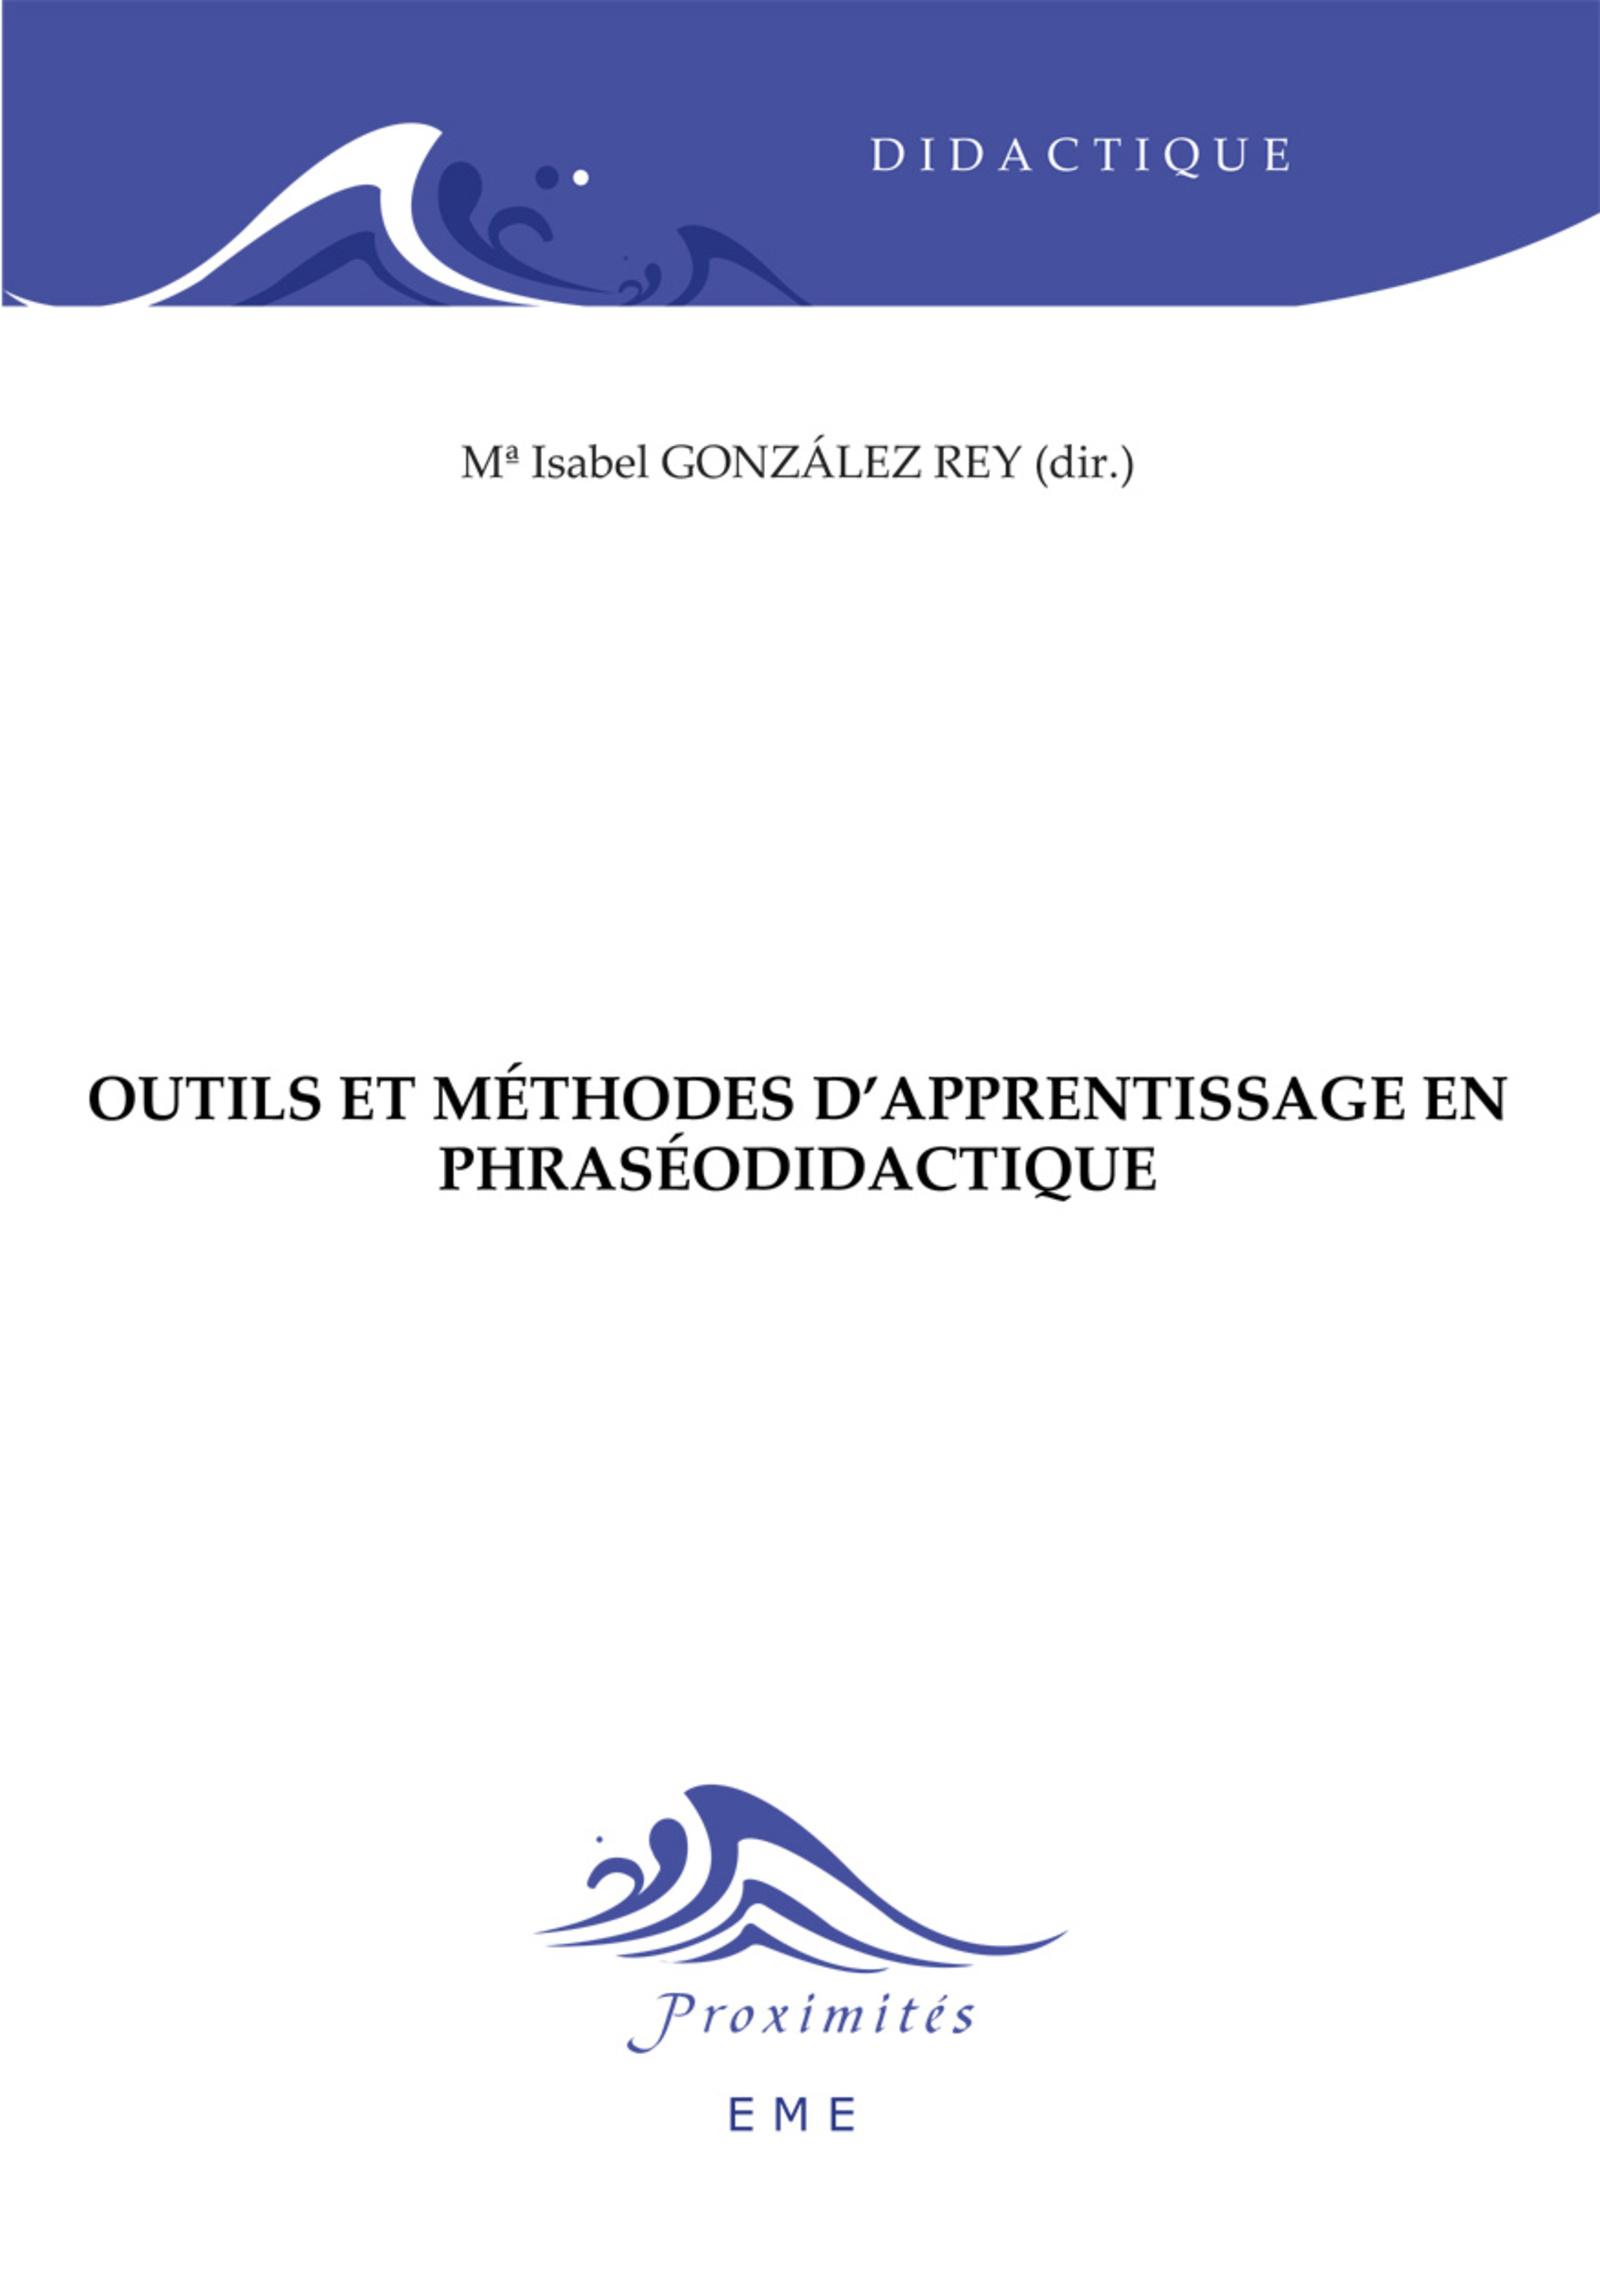 Outils et methodes